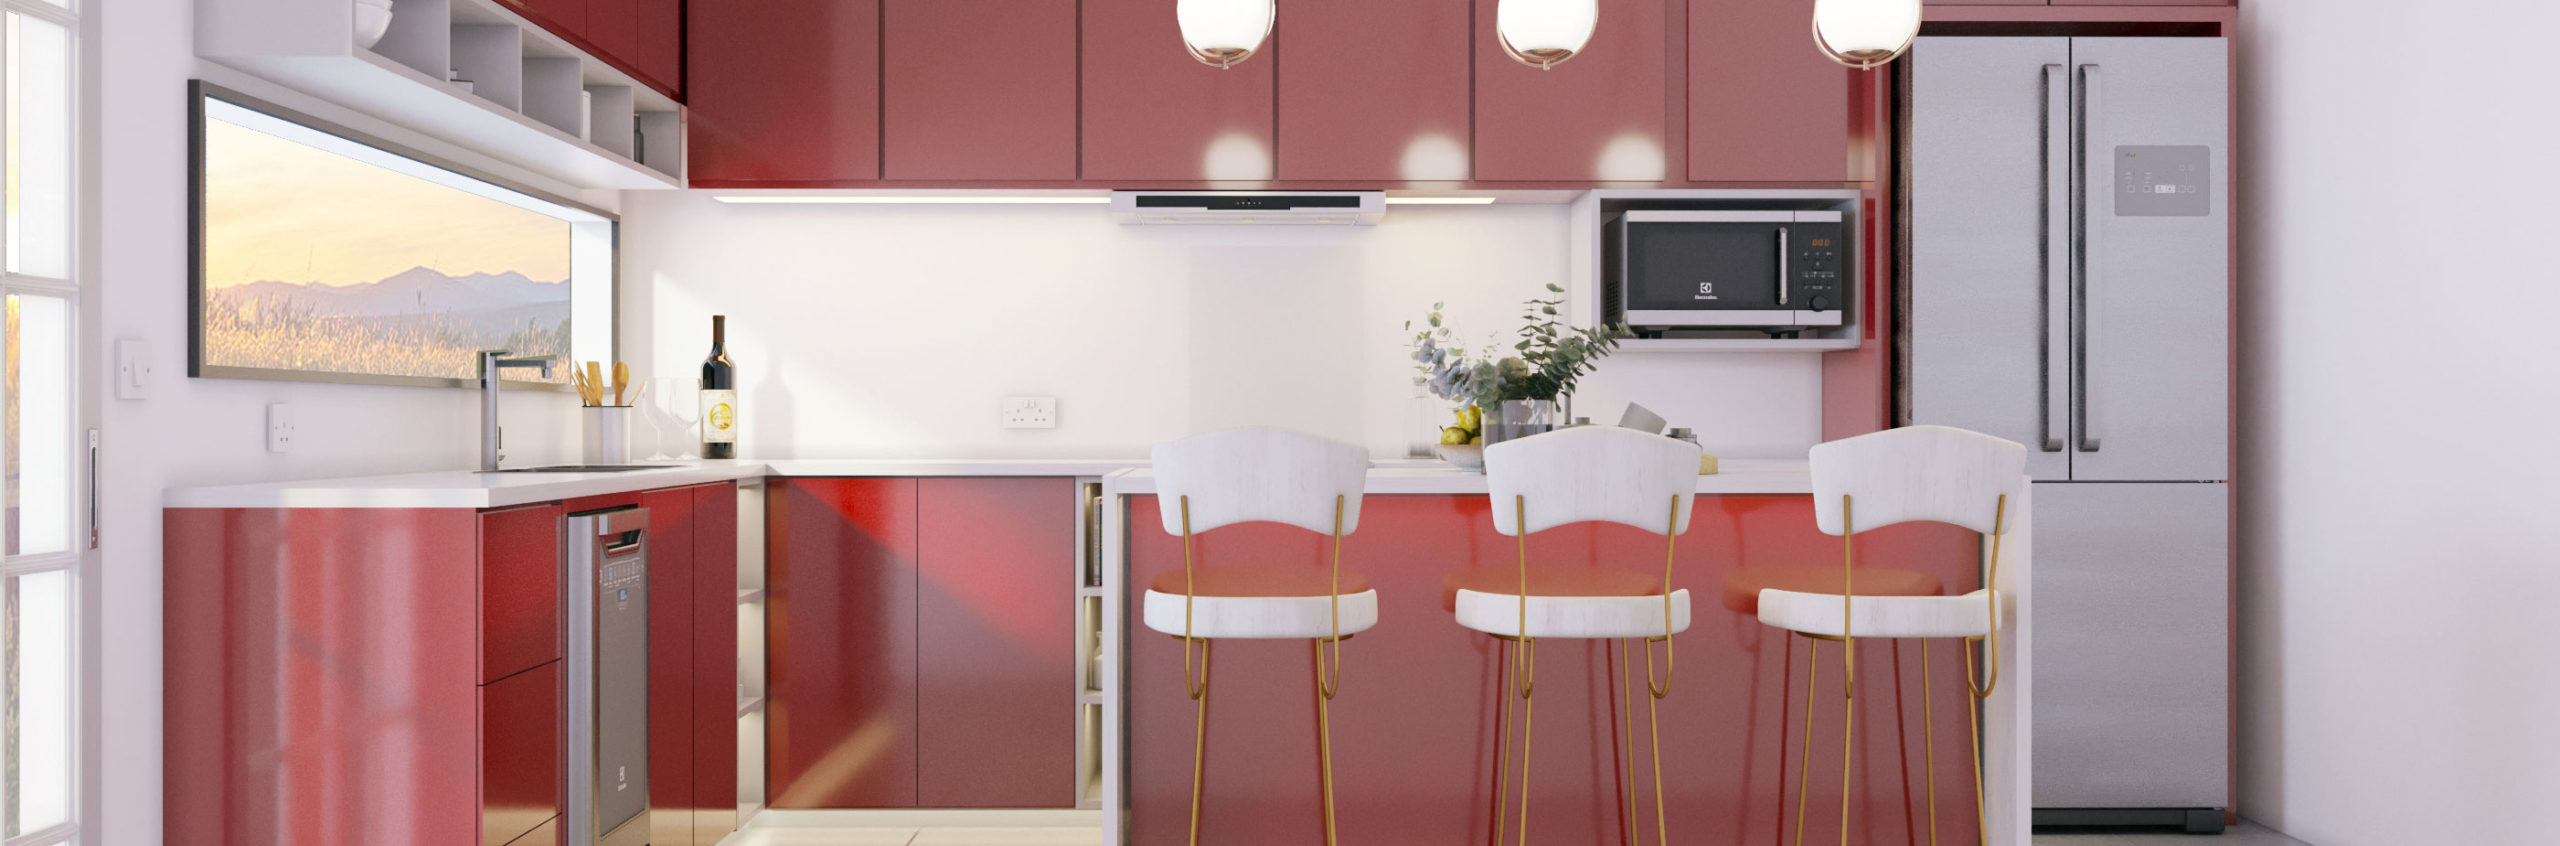 dream-kitchen-renovations-southport-renogurus